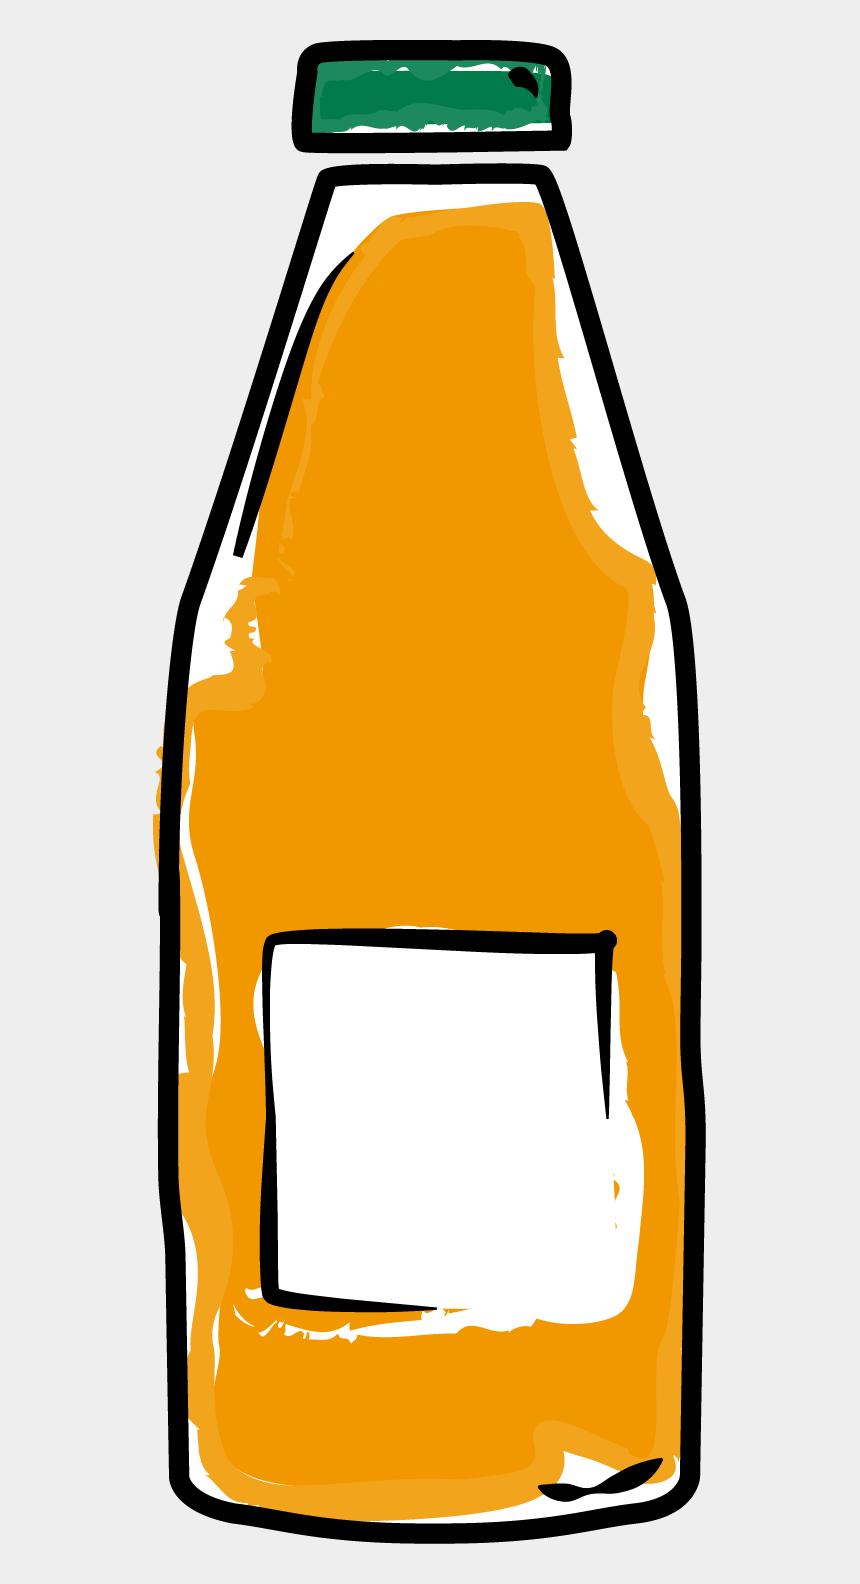 oranges clipart, Cartoons - Oranges Clipart Jus - Orange Juice Bottle Clipart